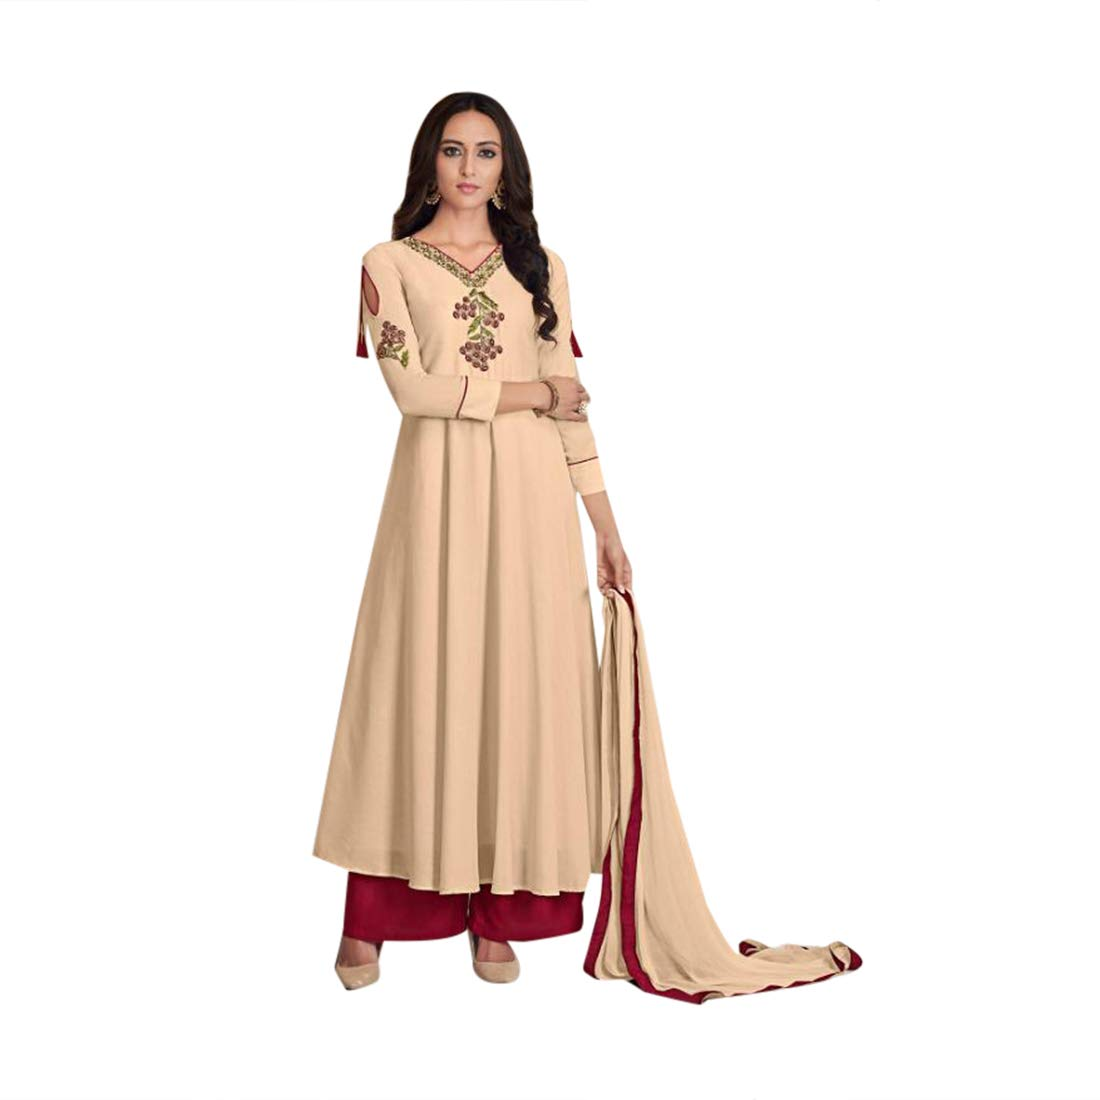 Eid special Indian Designer Maslin Plazo style Salwar Kameez Suit Women Evening Party wear Bespoke 7895 4